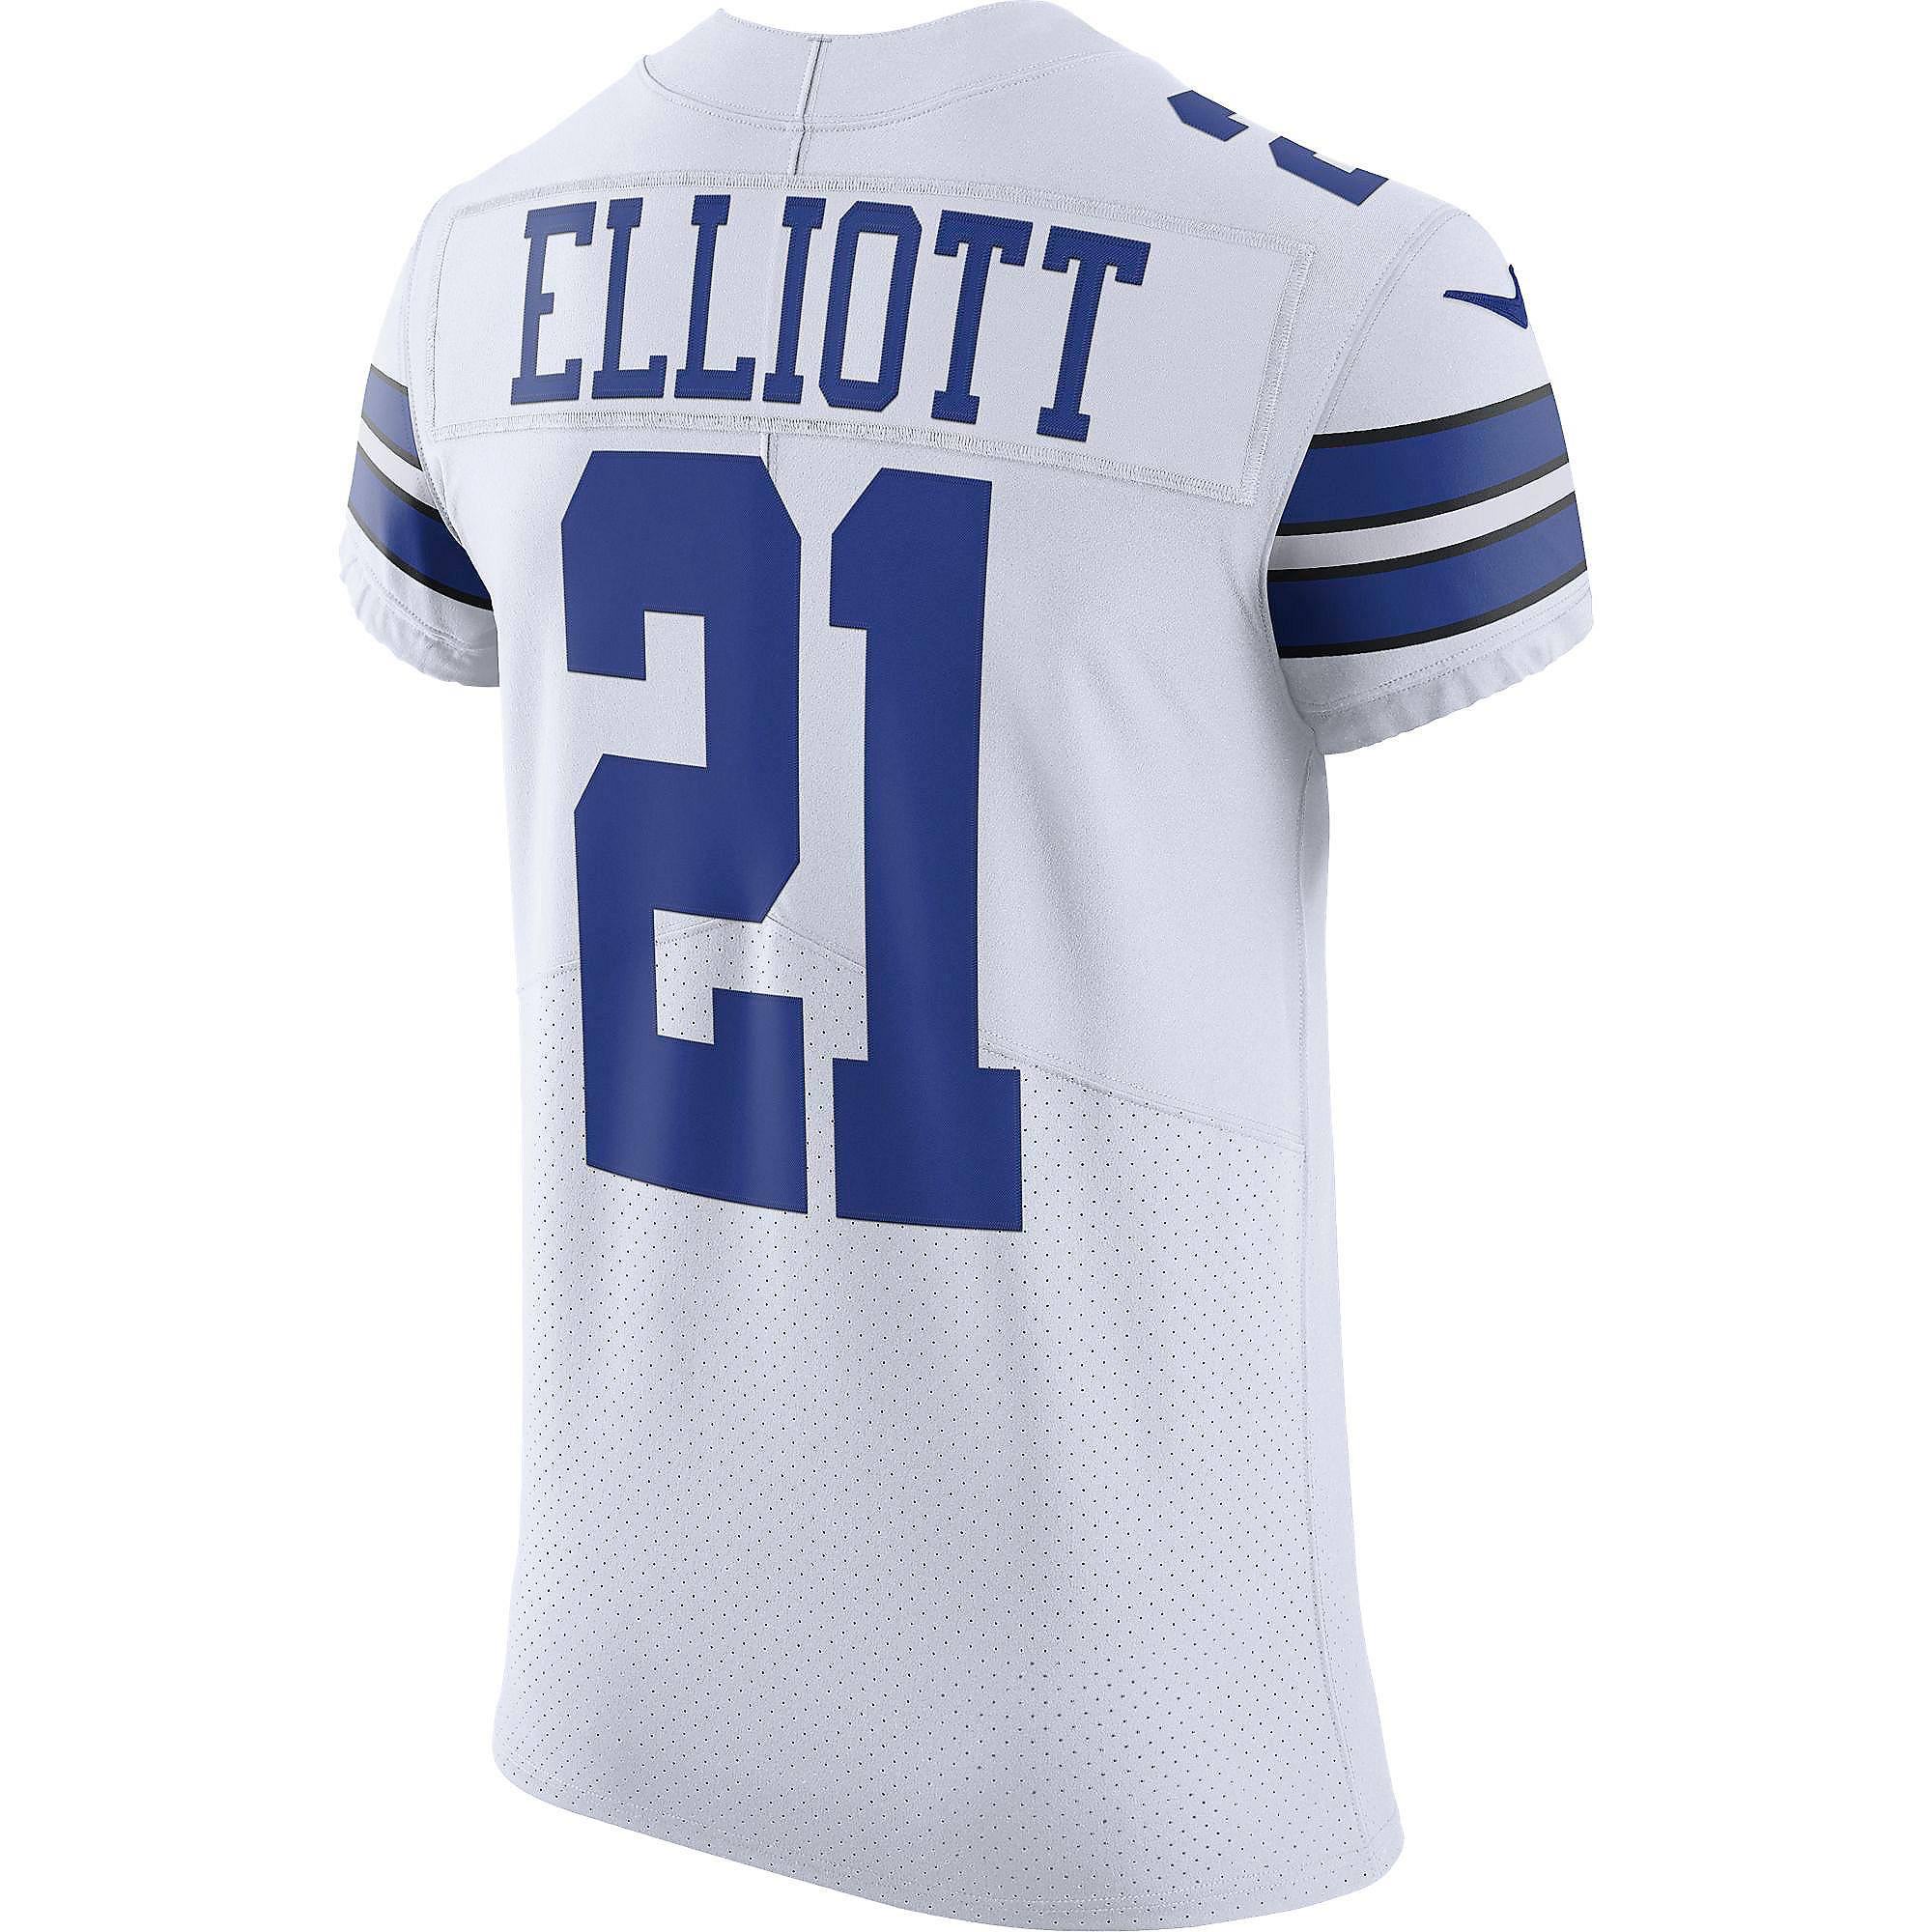 uk availability 2e2d2 42383 Dallas Cowboys Ezekiel Elliott #21 Nike Vapor Untouchable ...